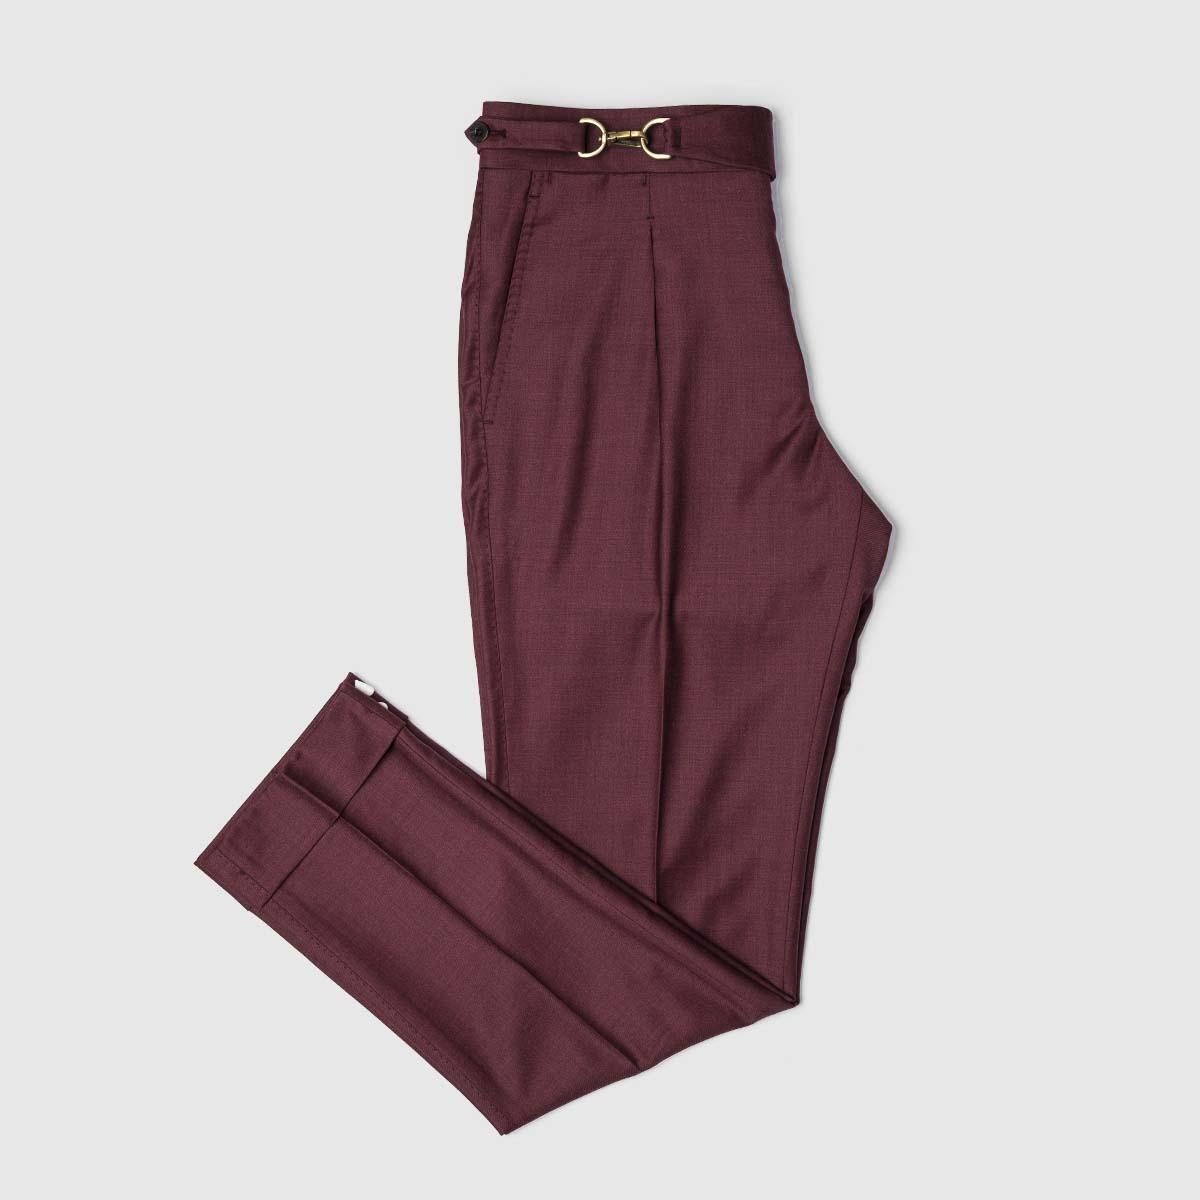 Pantaloni Purple 1 Pince in Lana 150's